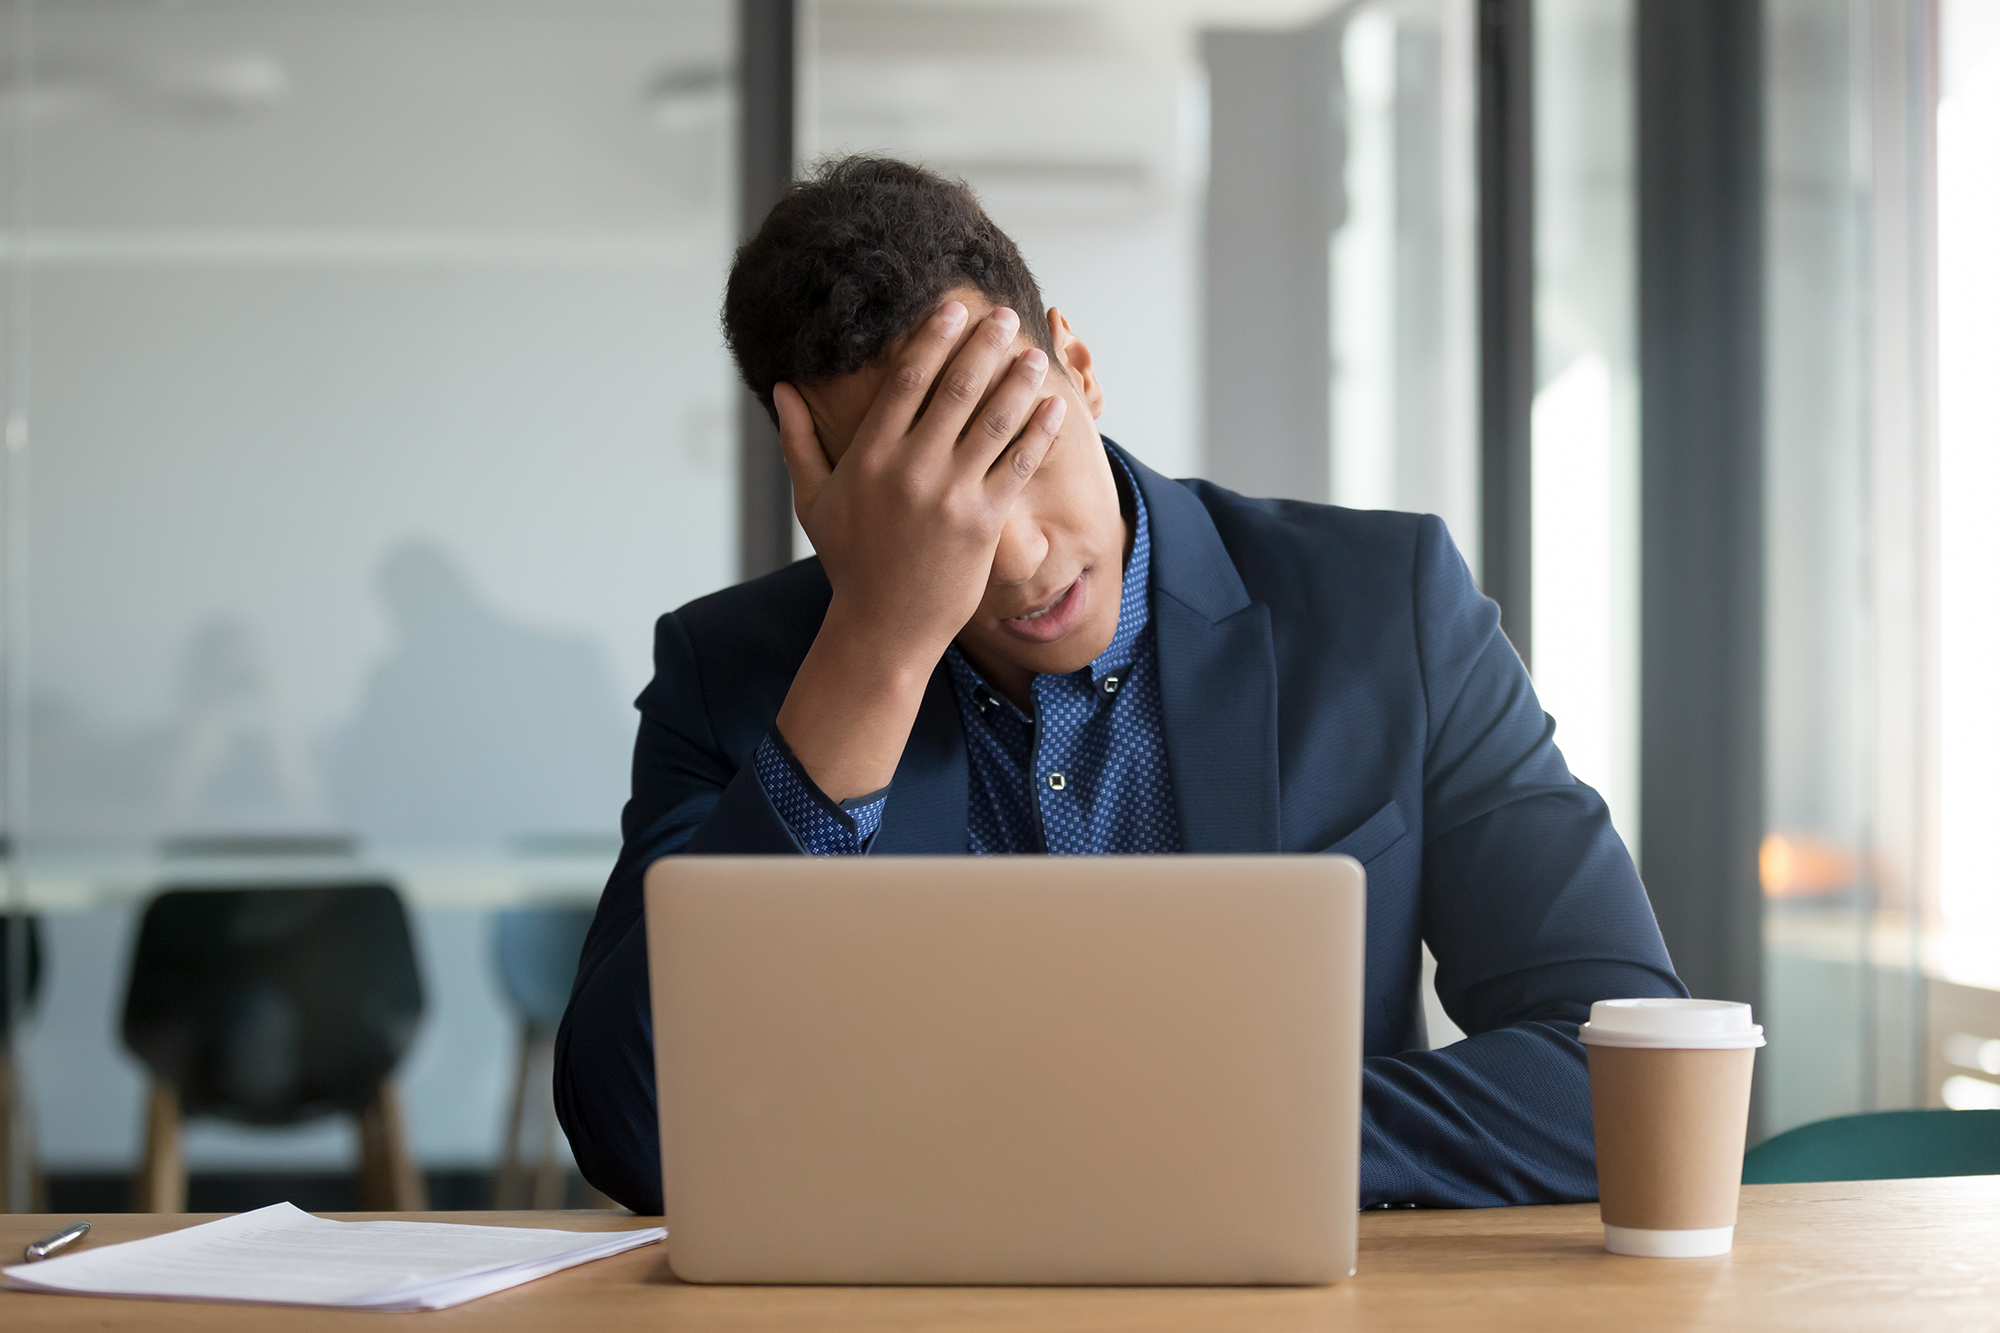 An upset man in a smart suit. (Image: Shutterstock)